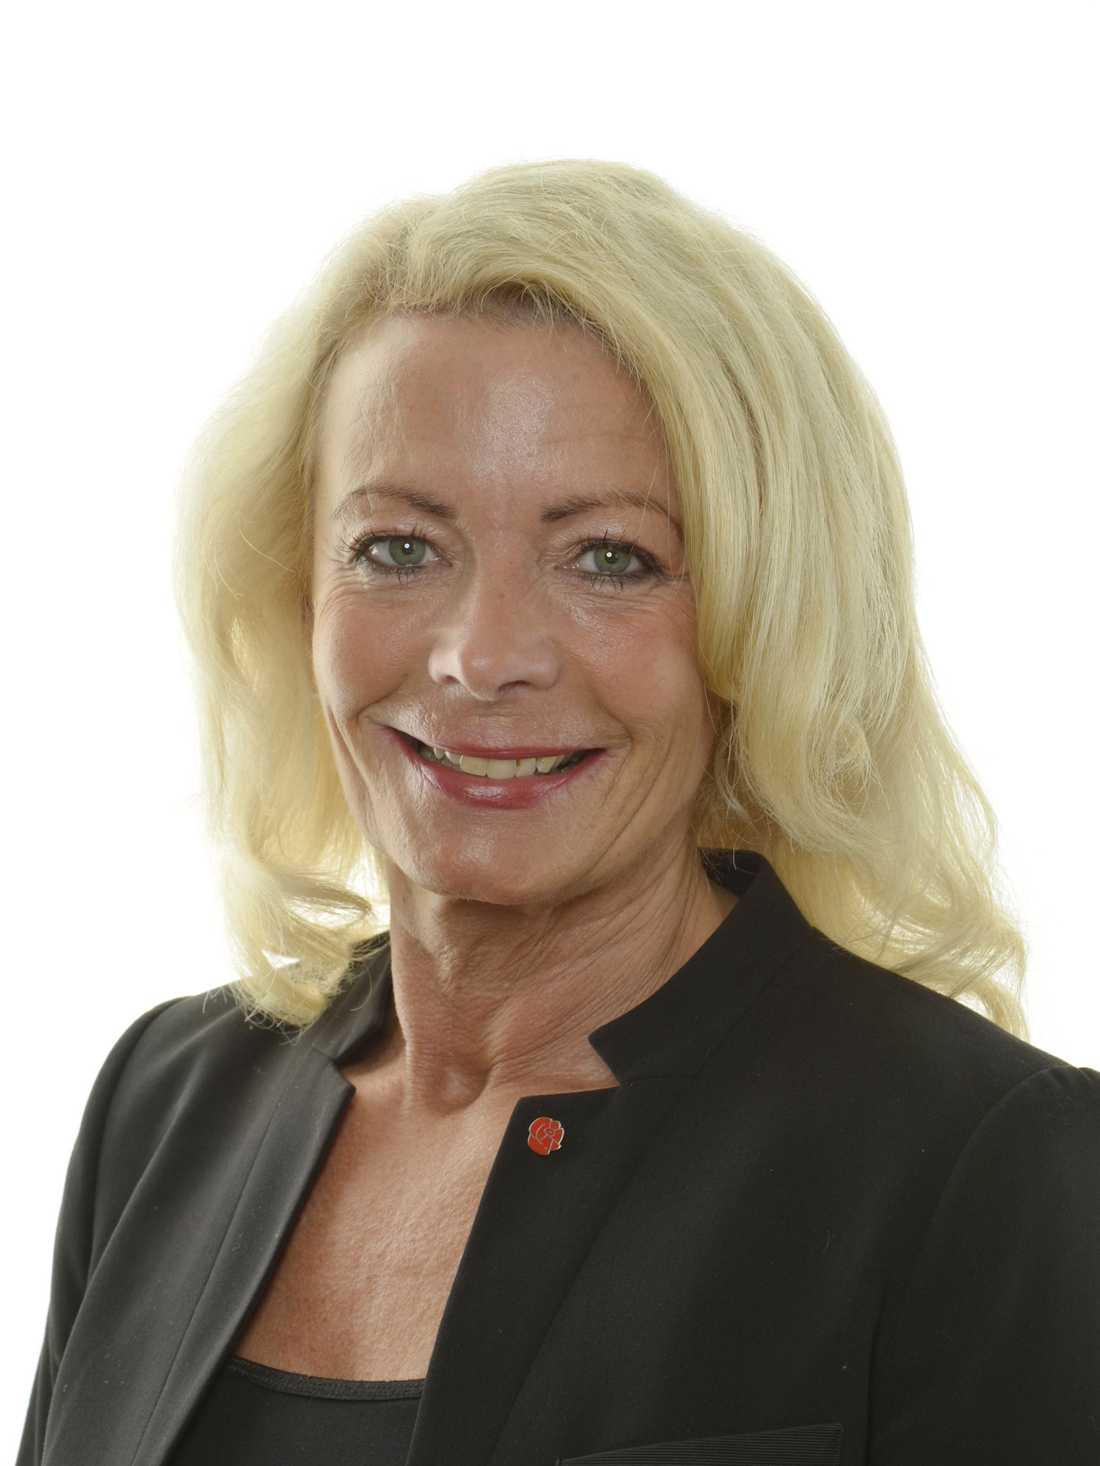 Pia Nilsson, S ordförande i Västmanland.